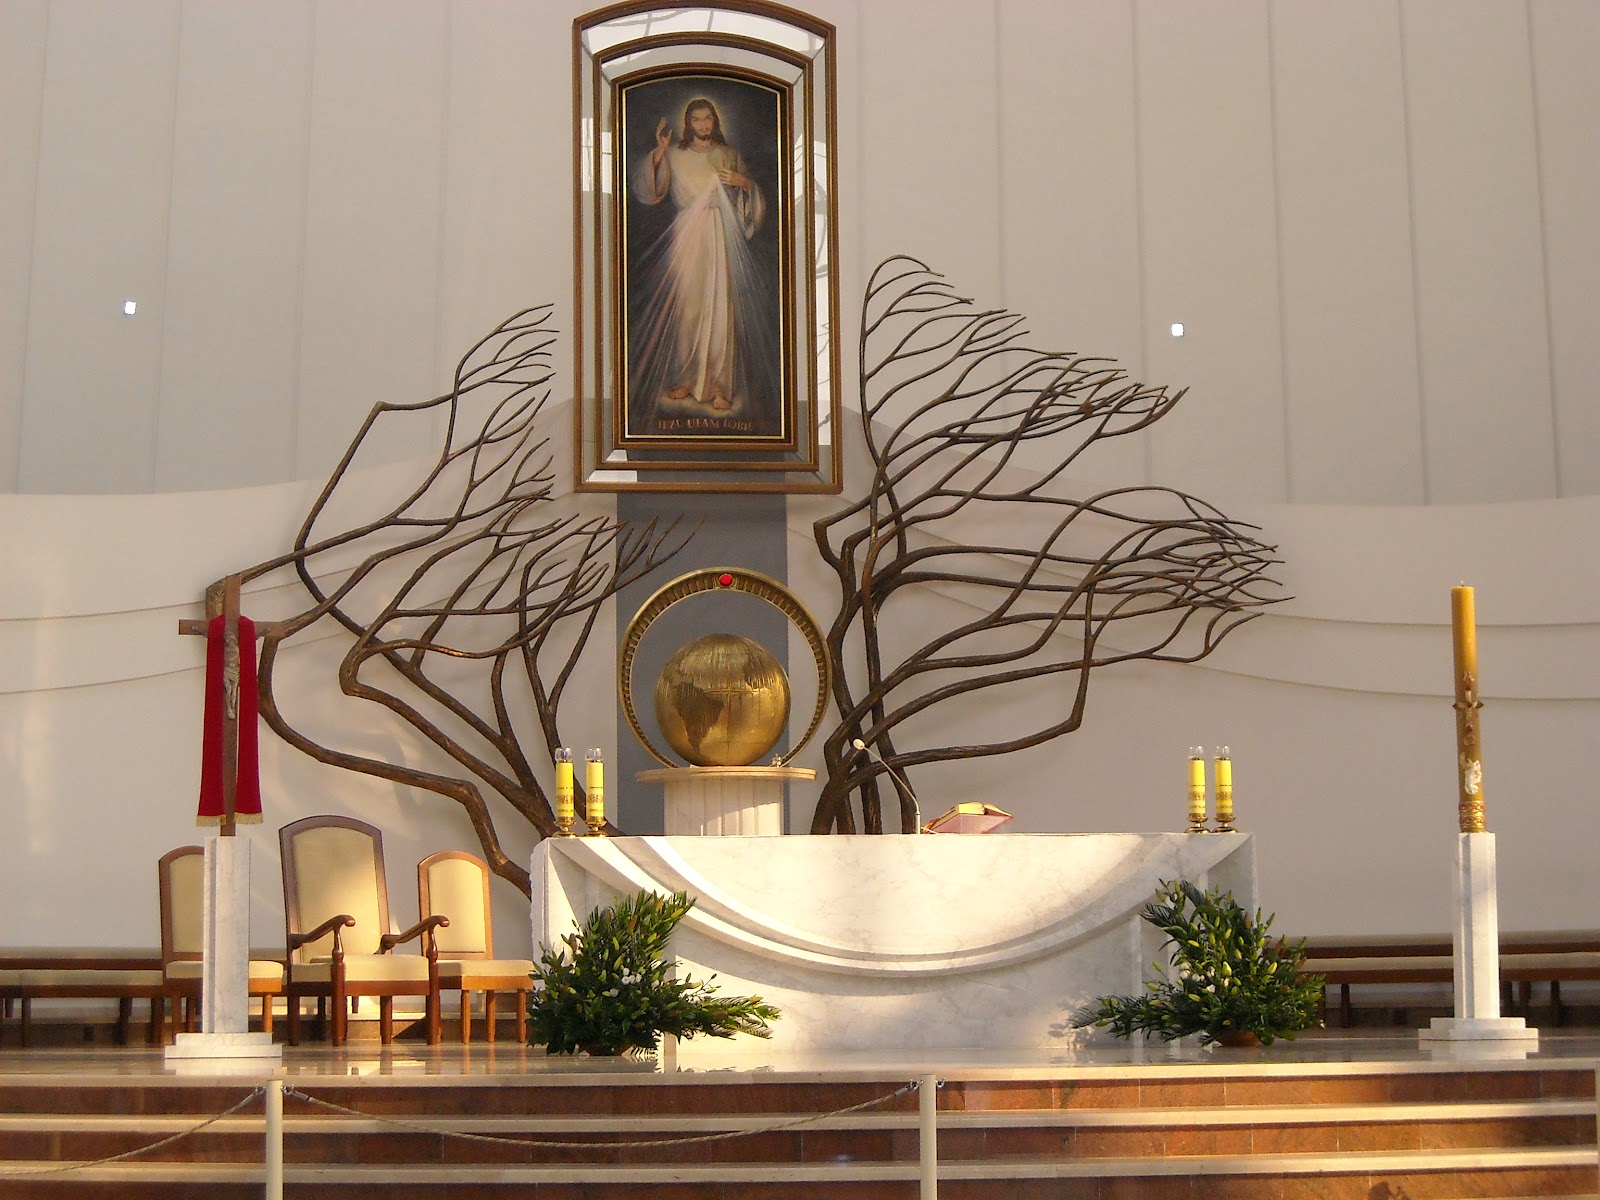 Cómo Jesús le Dictó a santa Faustina Kowalska la Coronilla de la Divina Misericordia